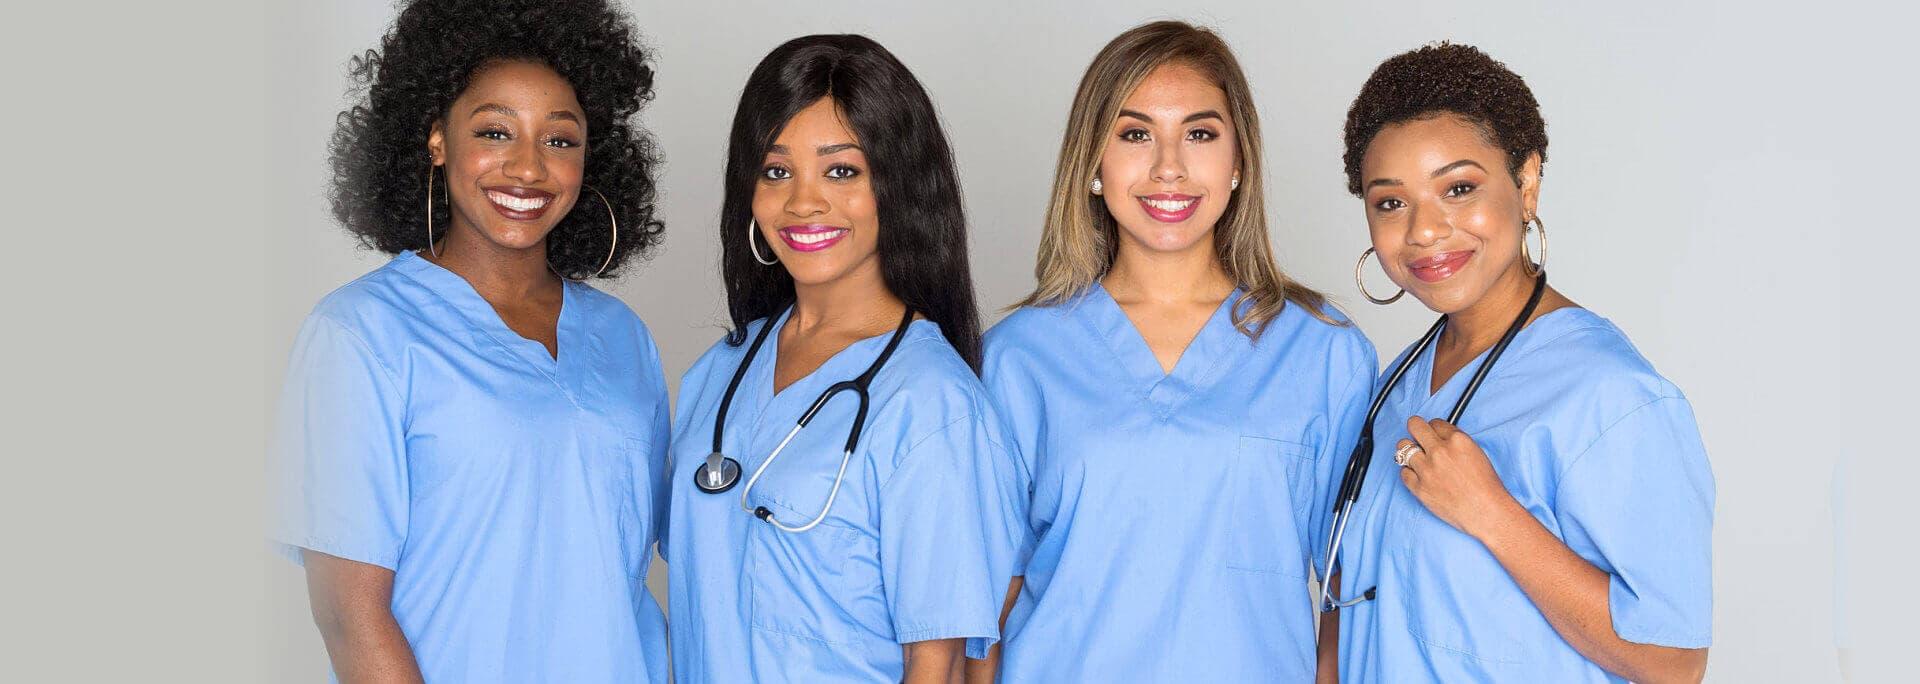 four lady nurse